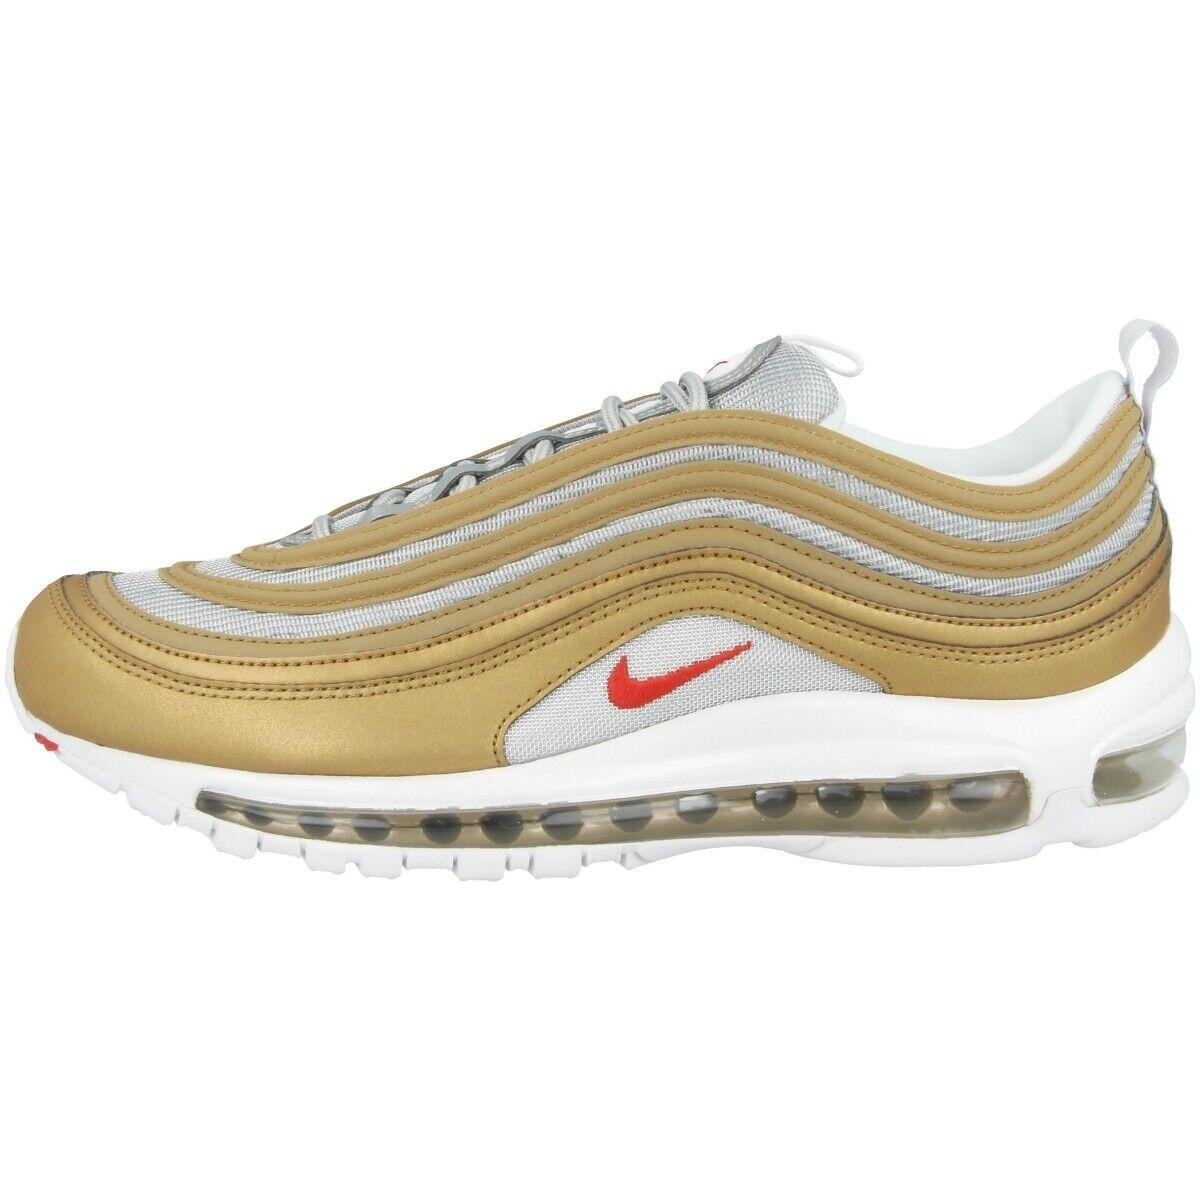 Nike Air Max 97 SSL Schuhe Herren Freizeit Turnschuhe metallic Gold rot BV0306-700